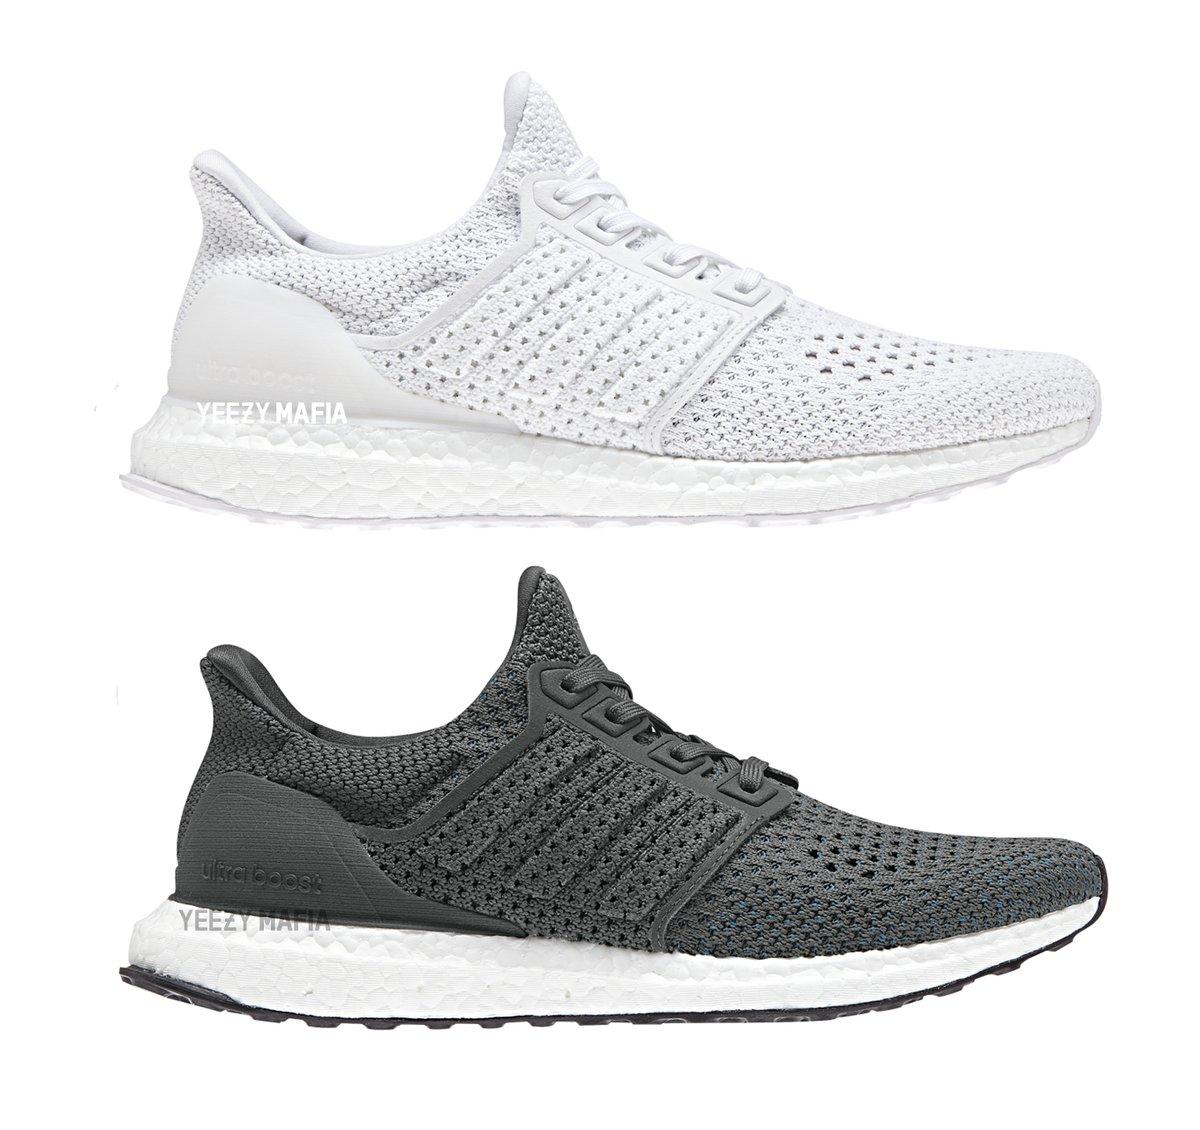 Große Auswahl Adidas Ultra Boost, Adidas Climachill Ultra